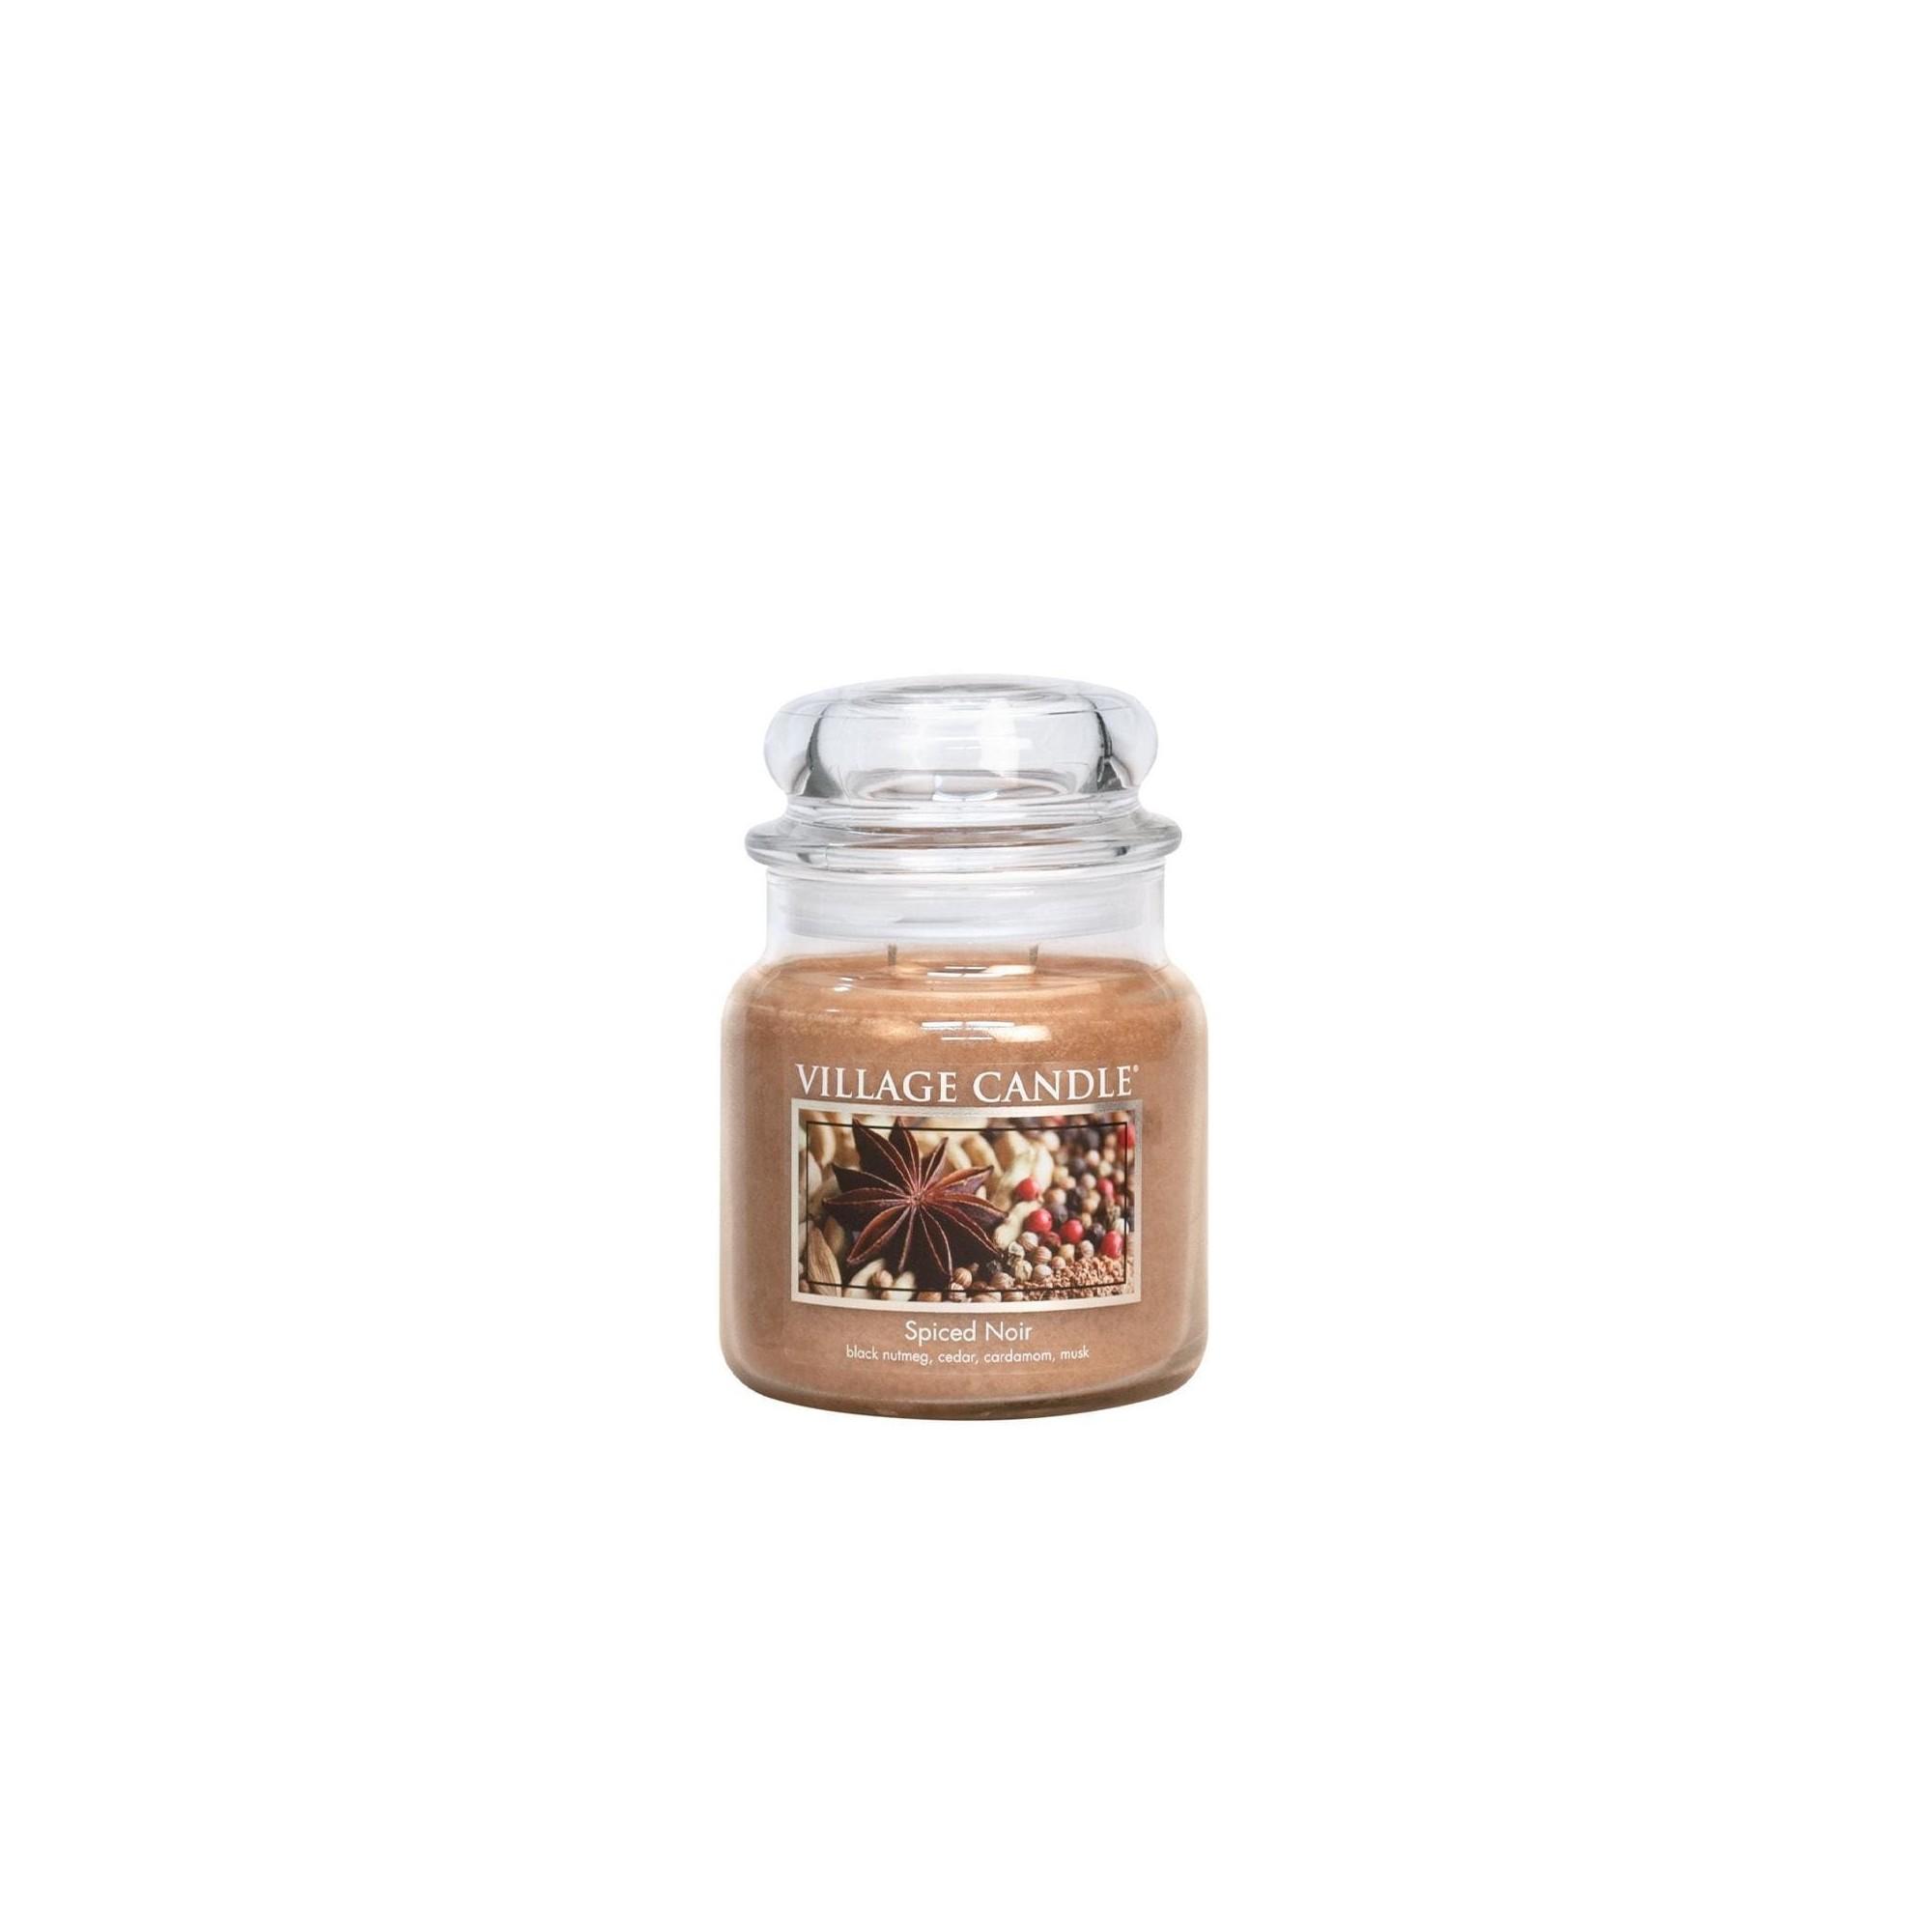 Village Candle Spiced Noir Medium Jar Glass